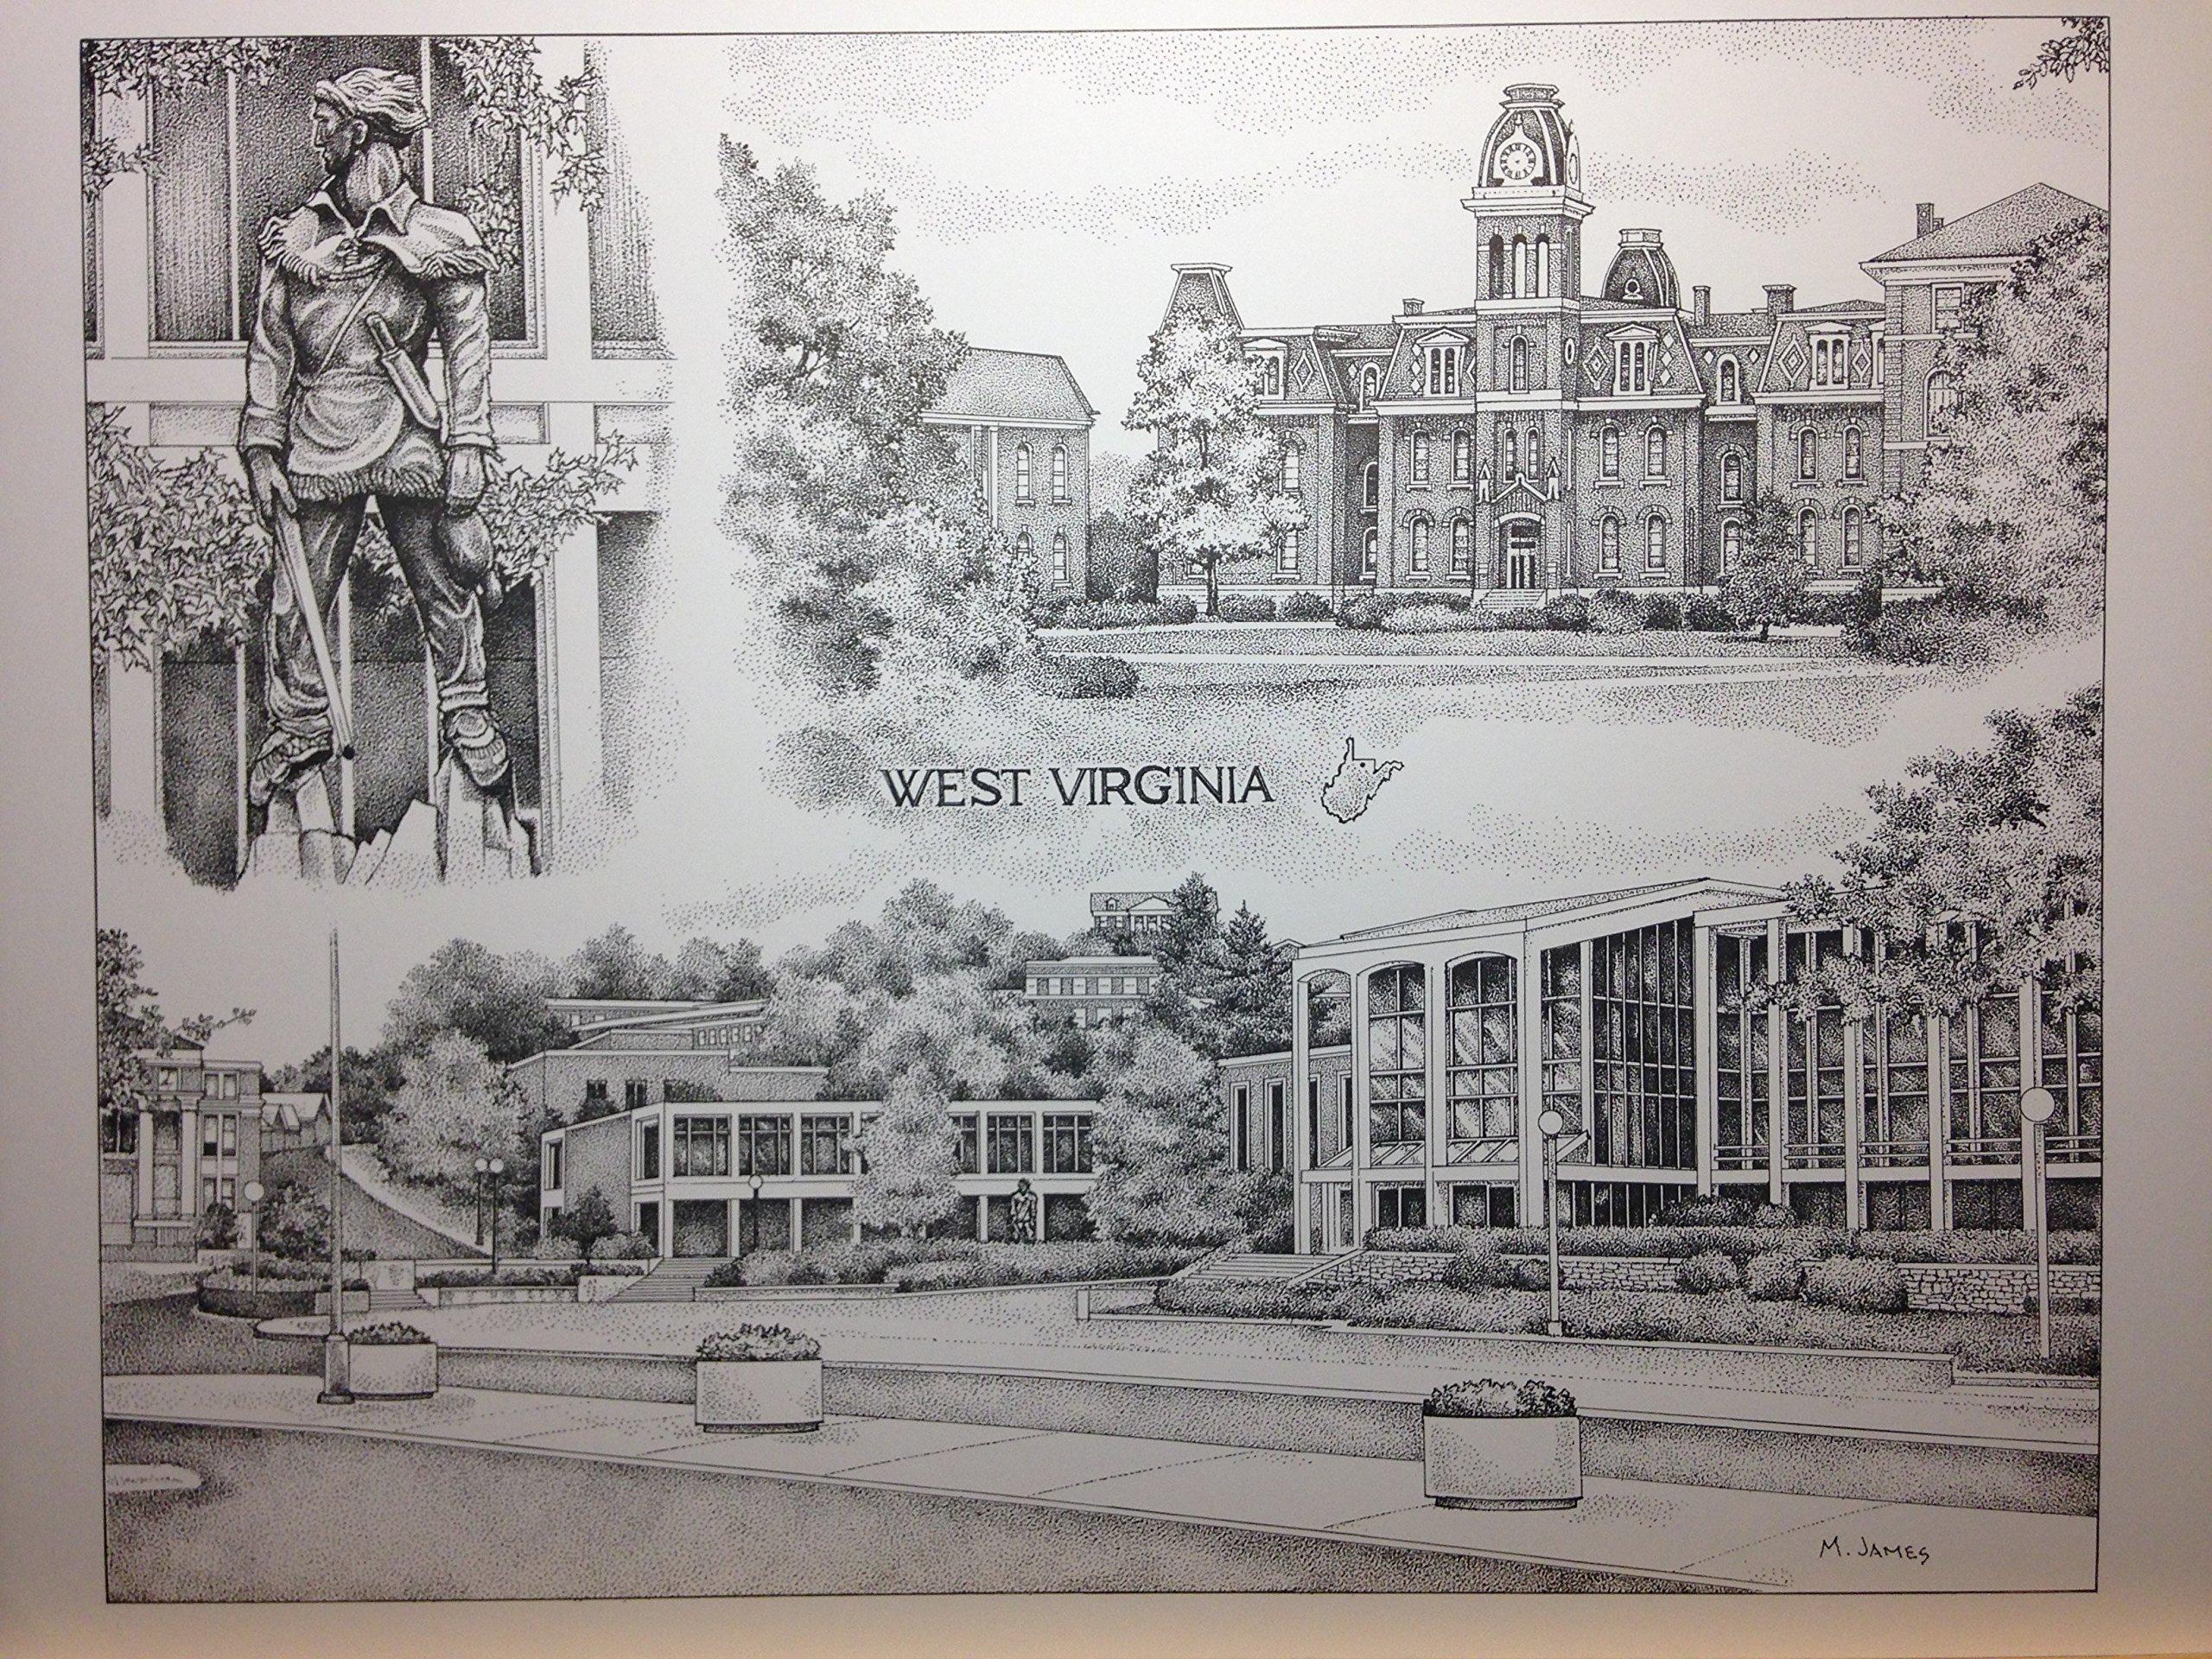 West Virginia University 12x16 collage print